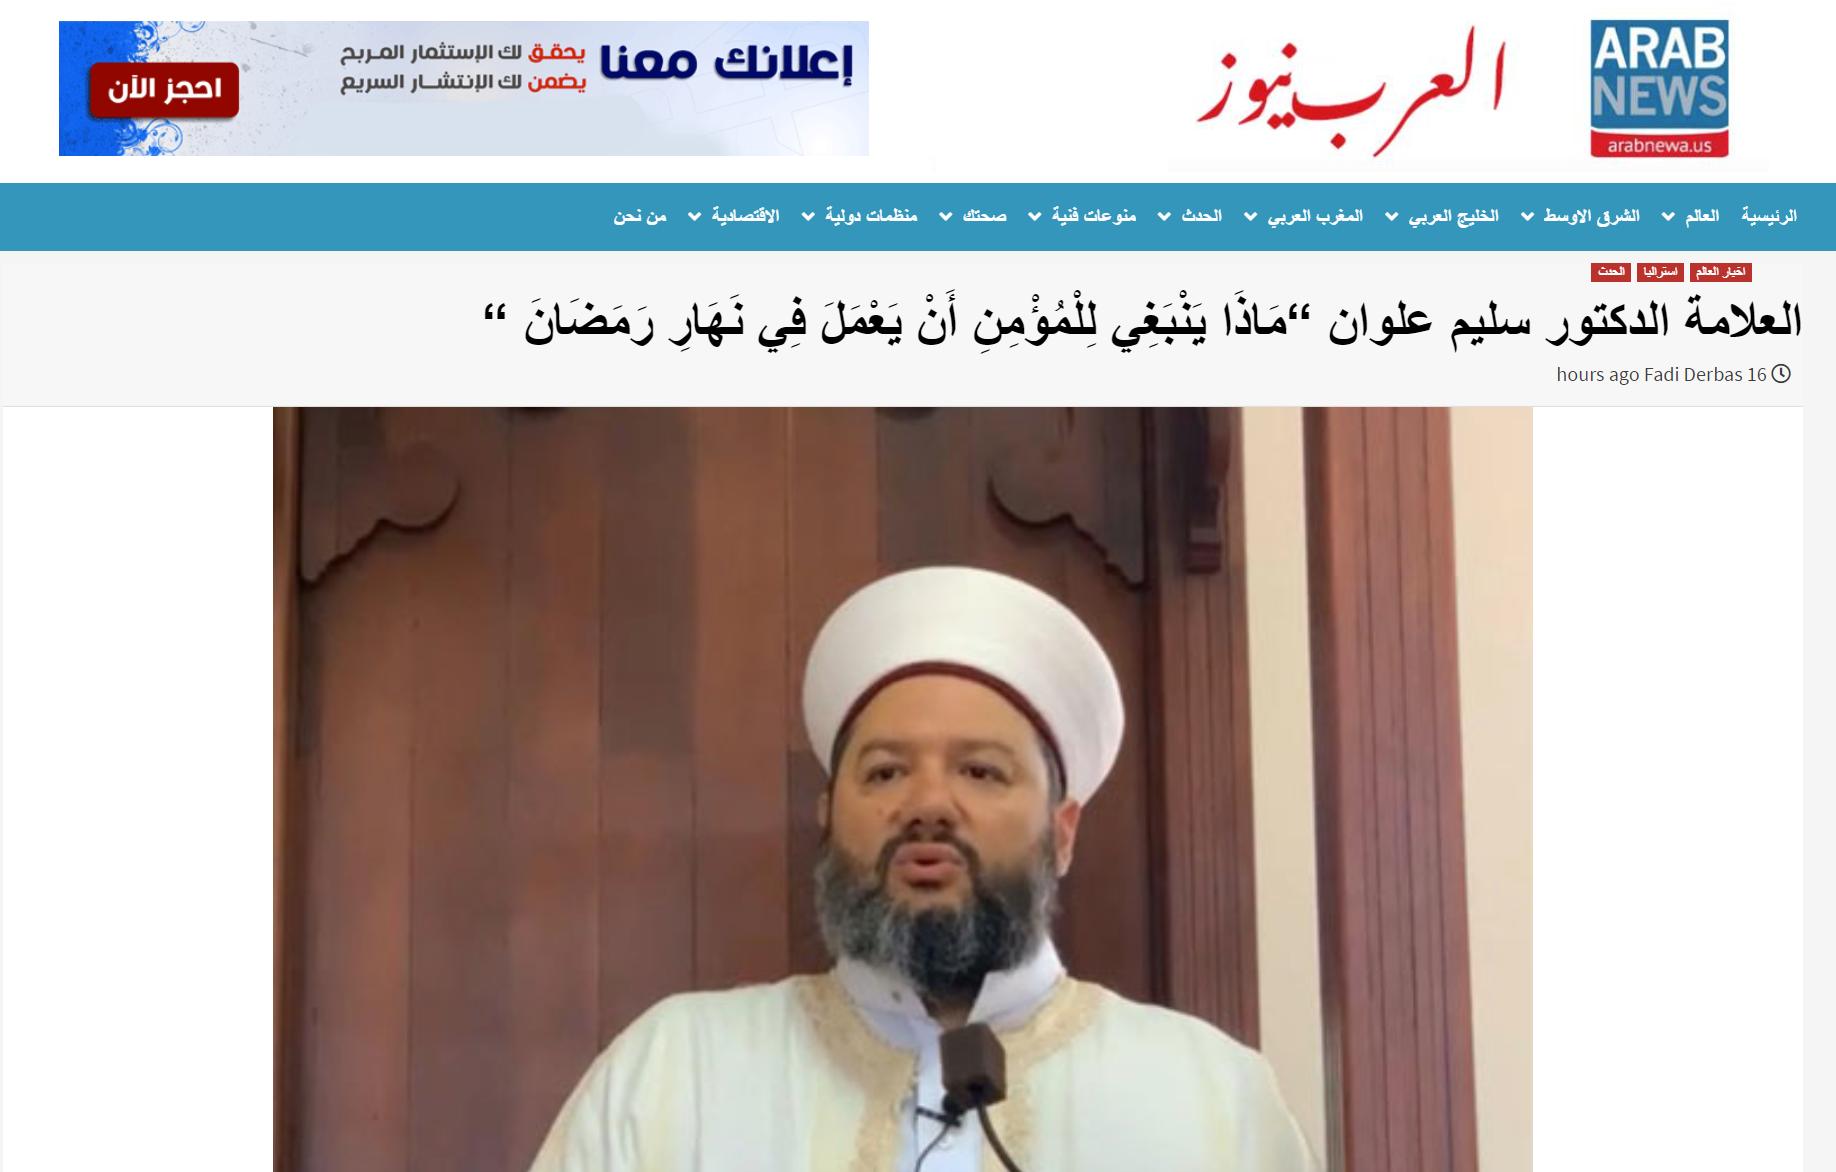 arab news - Friday sermon 16-04-2021